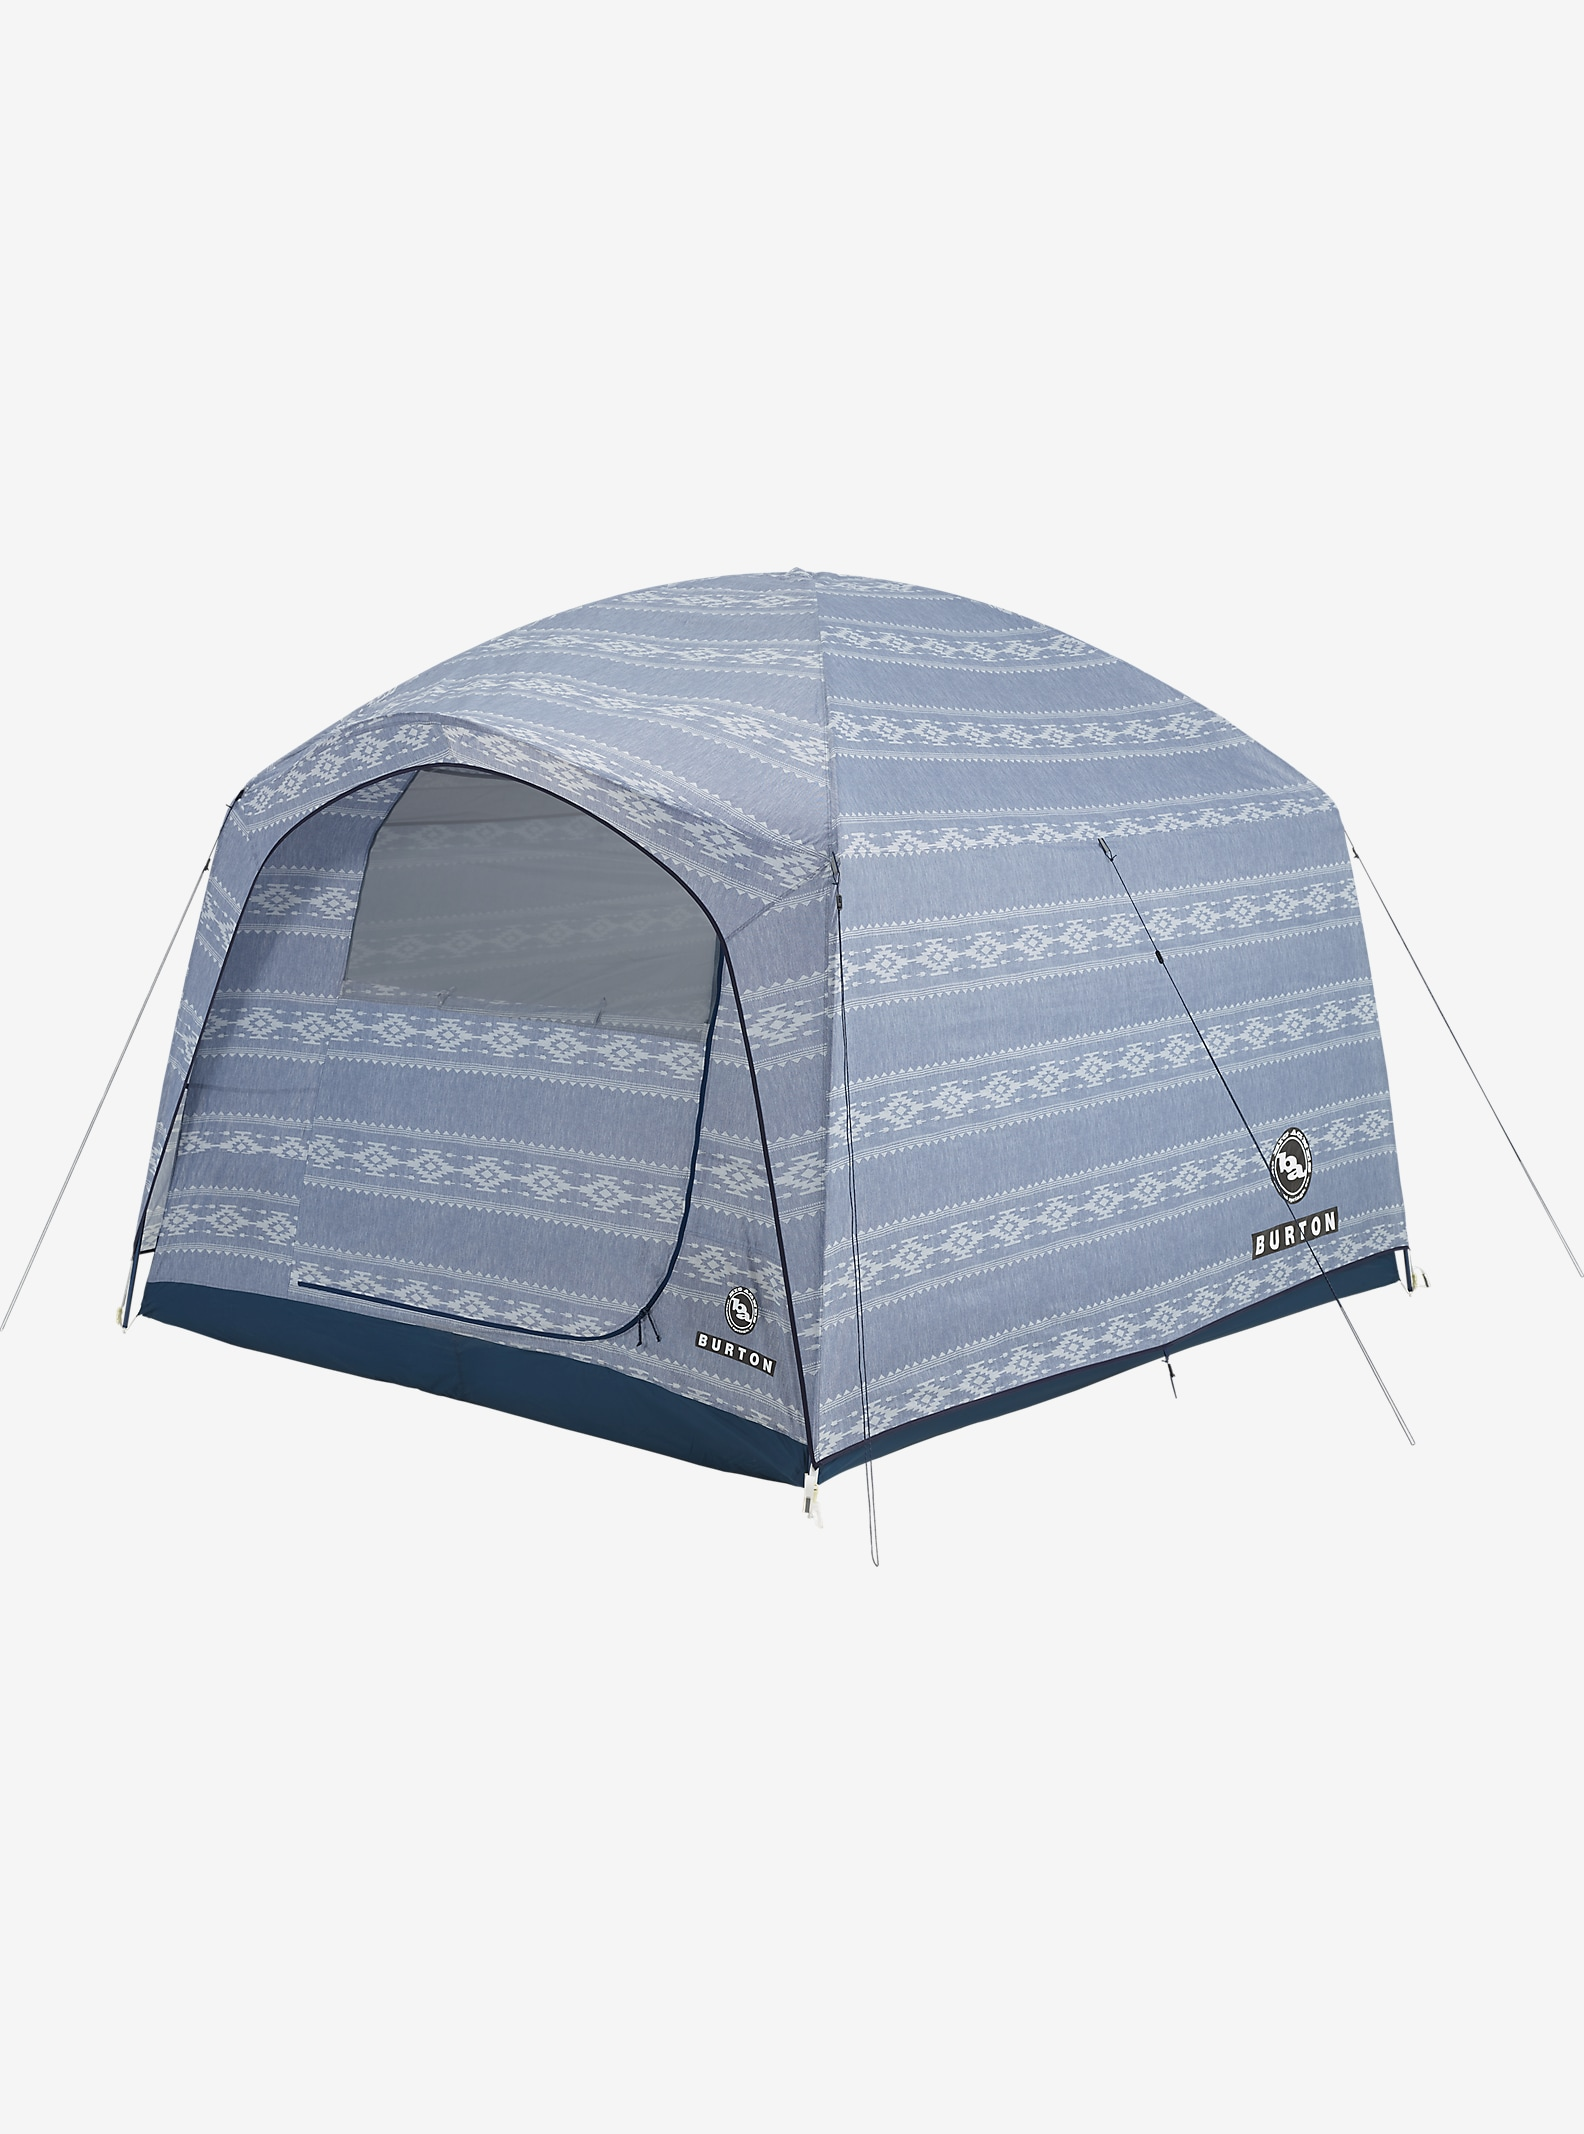 Big Agnes x Burton Stone Hut Tent shown in Famish Stripe